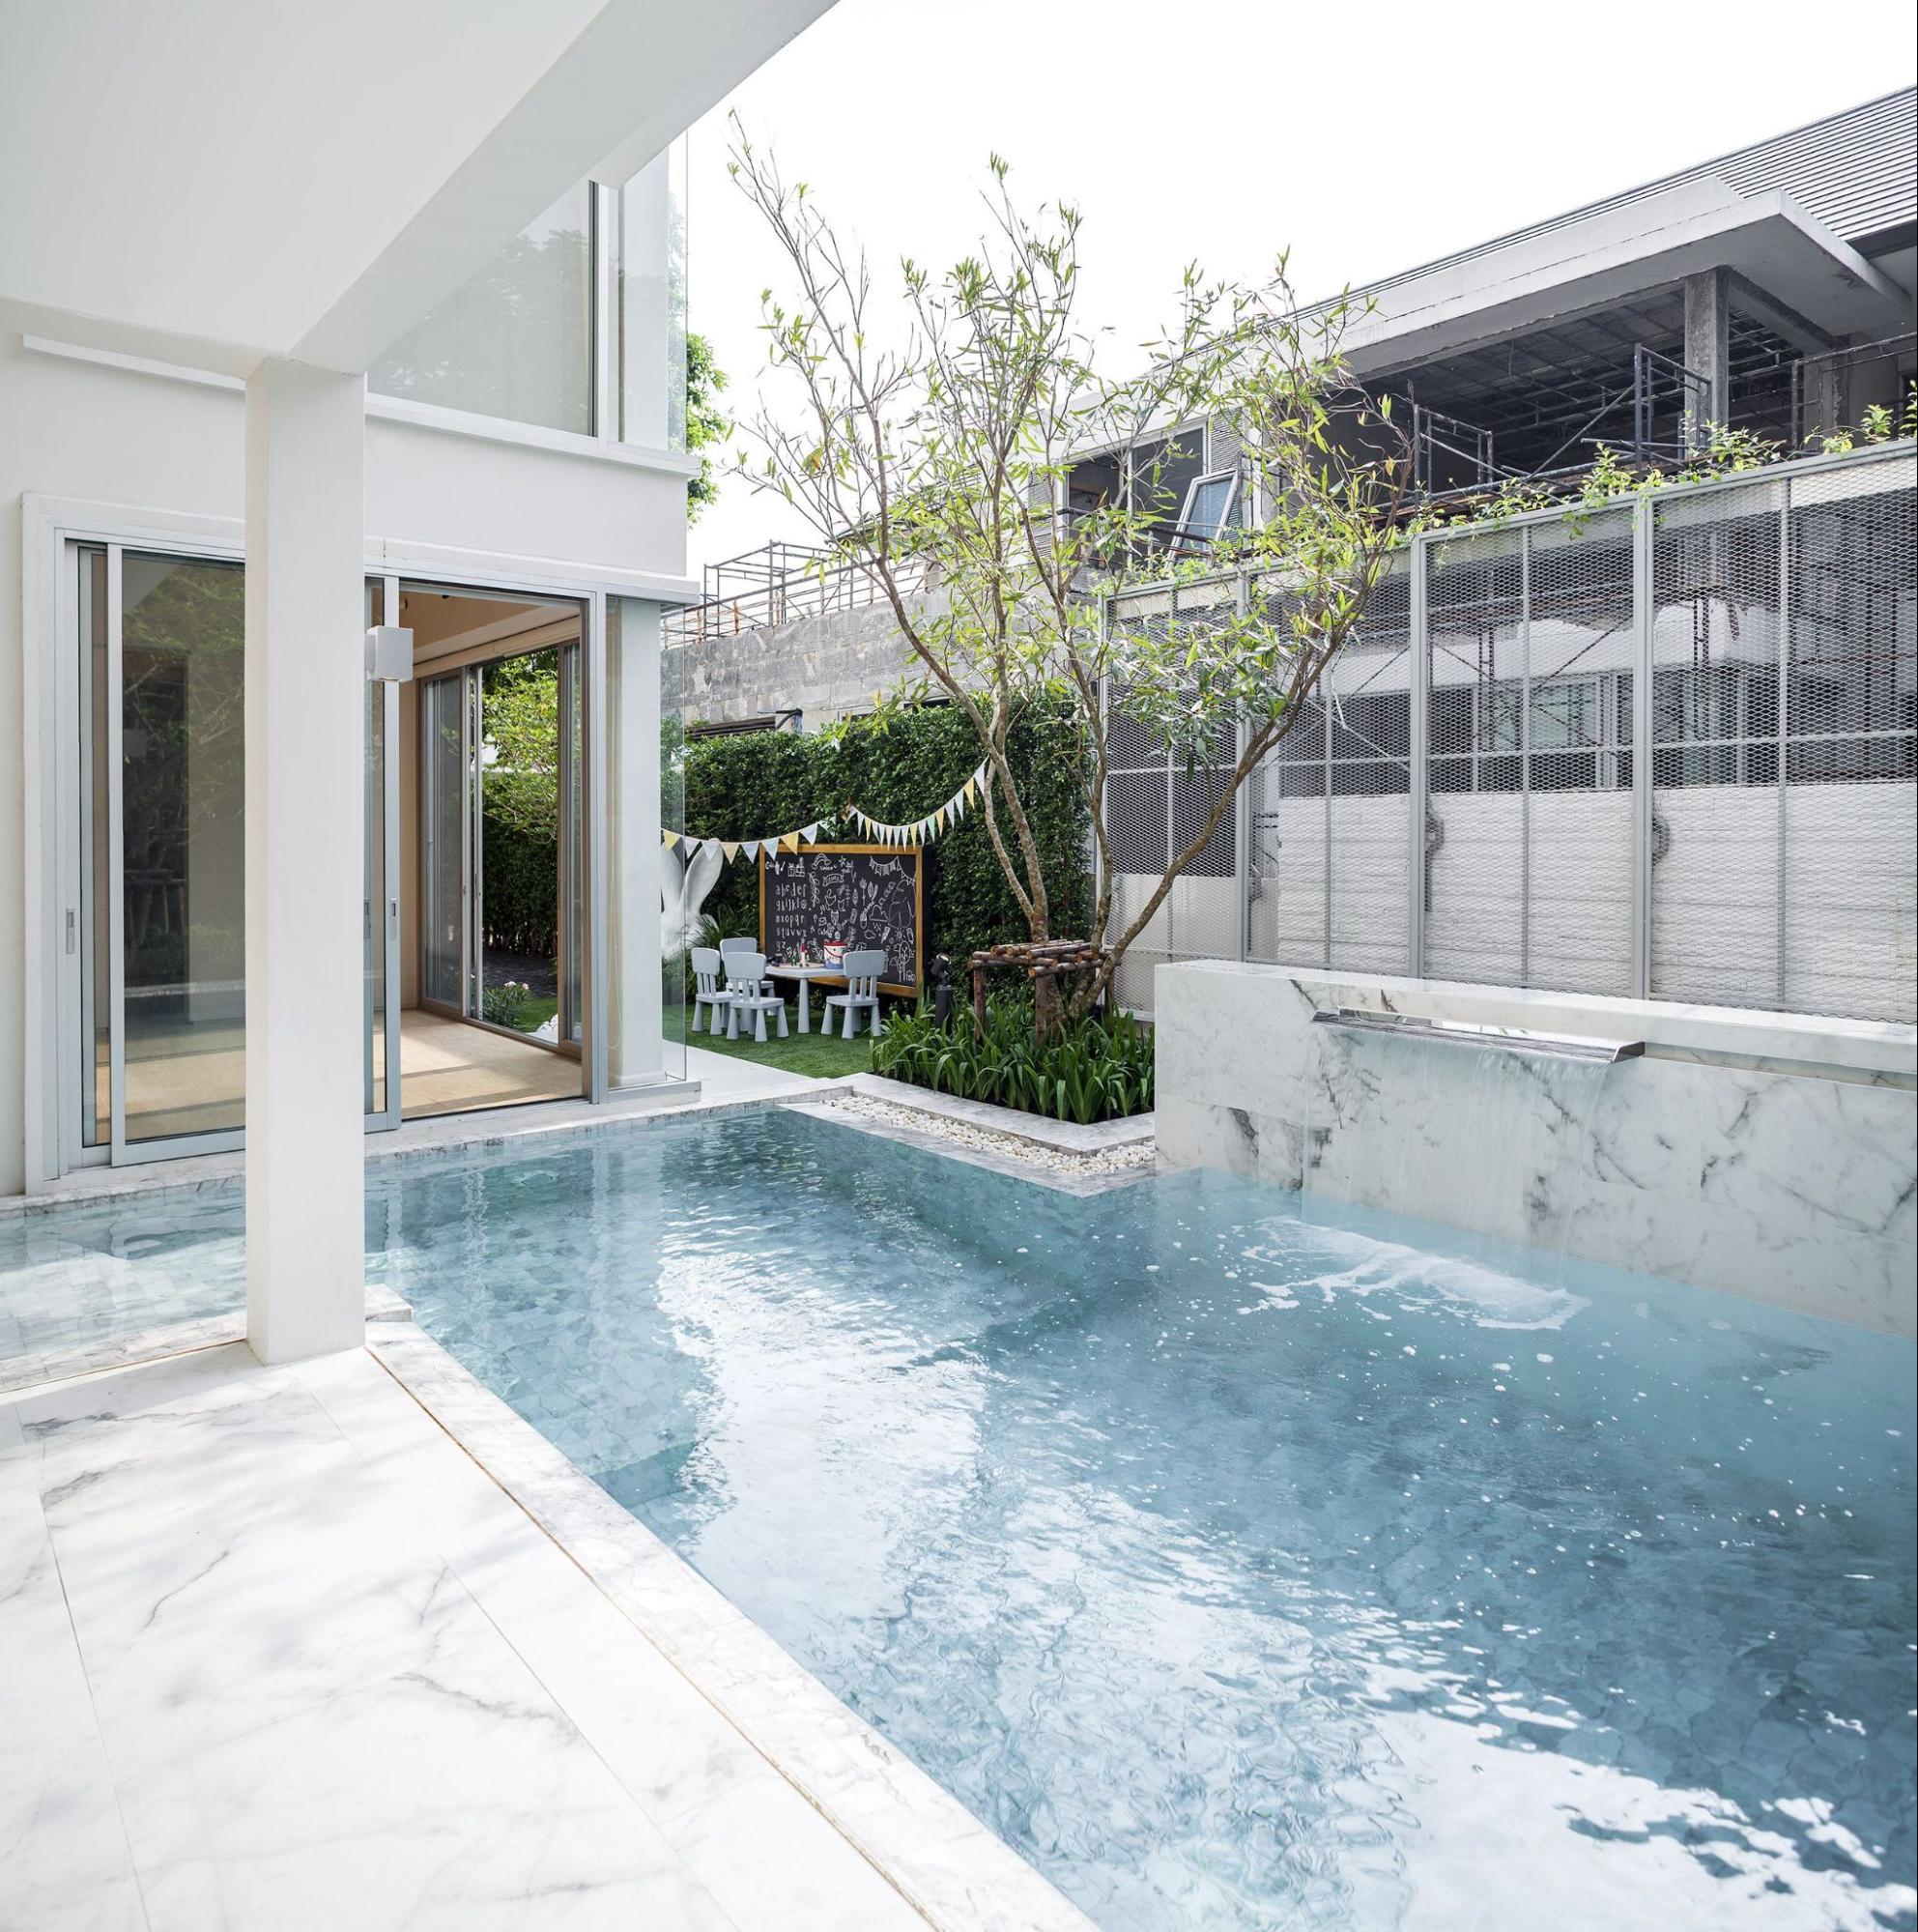 Statuario Marble Tiles In Pool Area